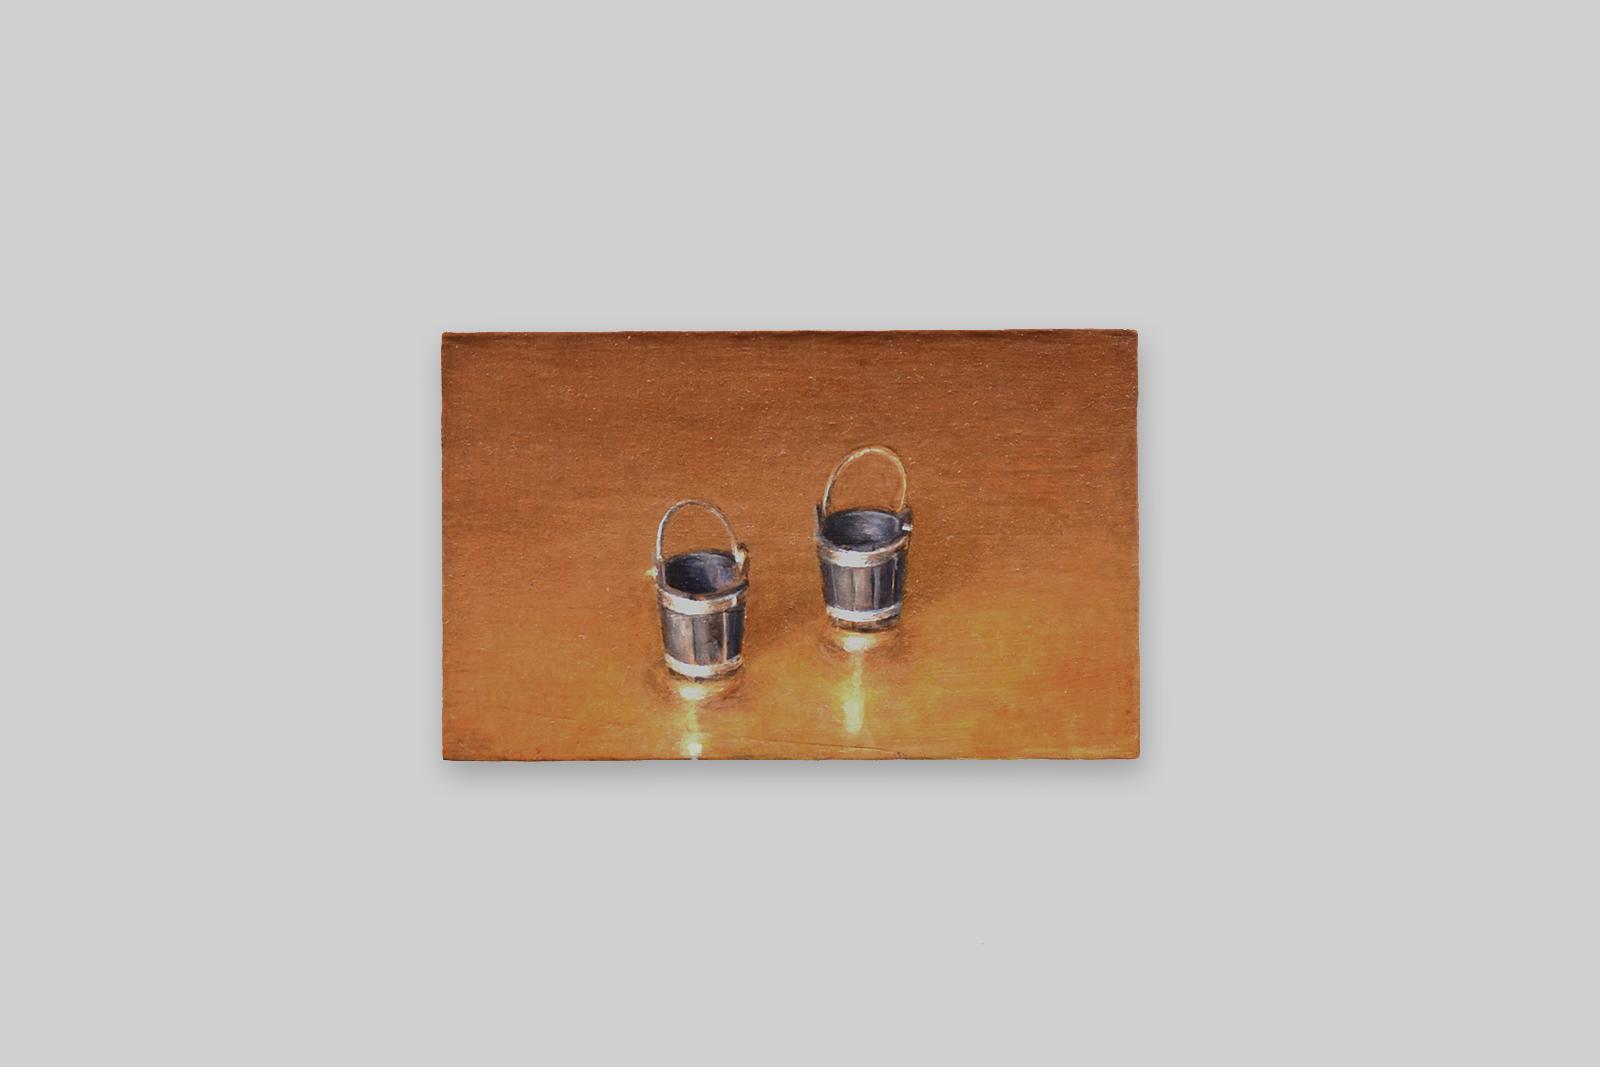 'emmertjes', 2010, olieverf/paneel, 11 x 18 cm